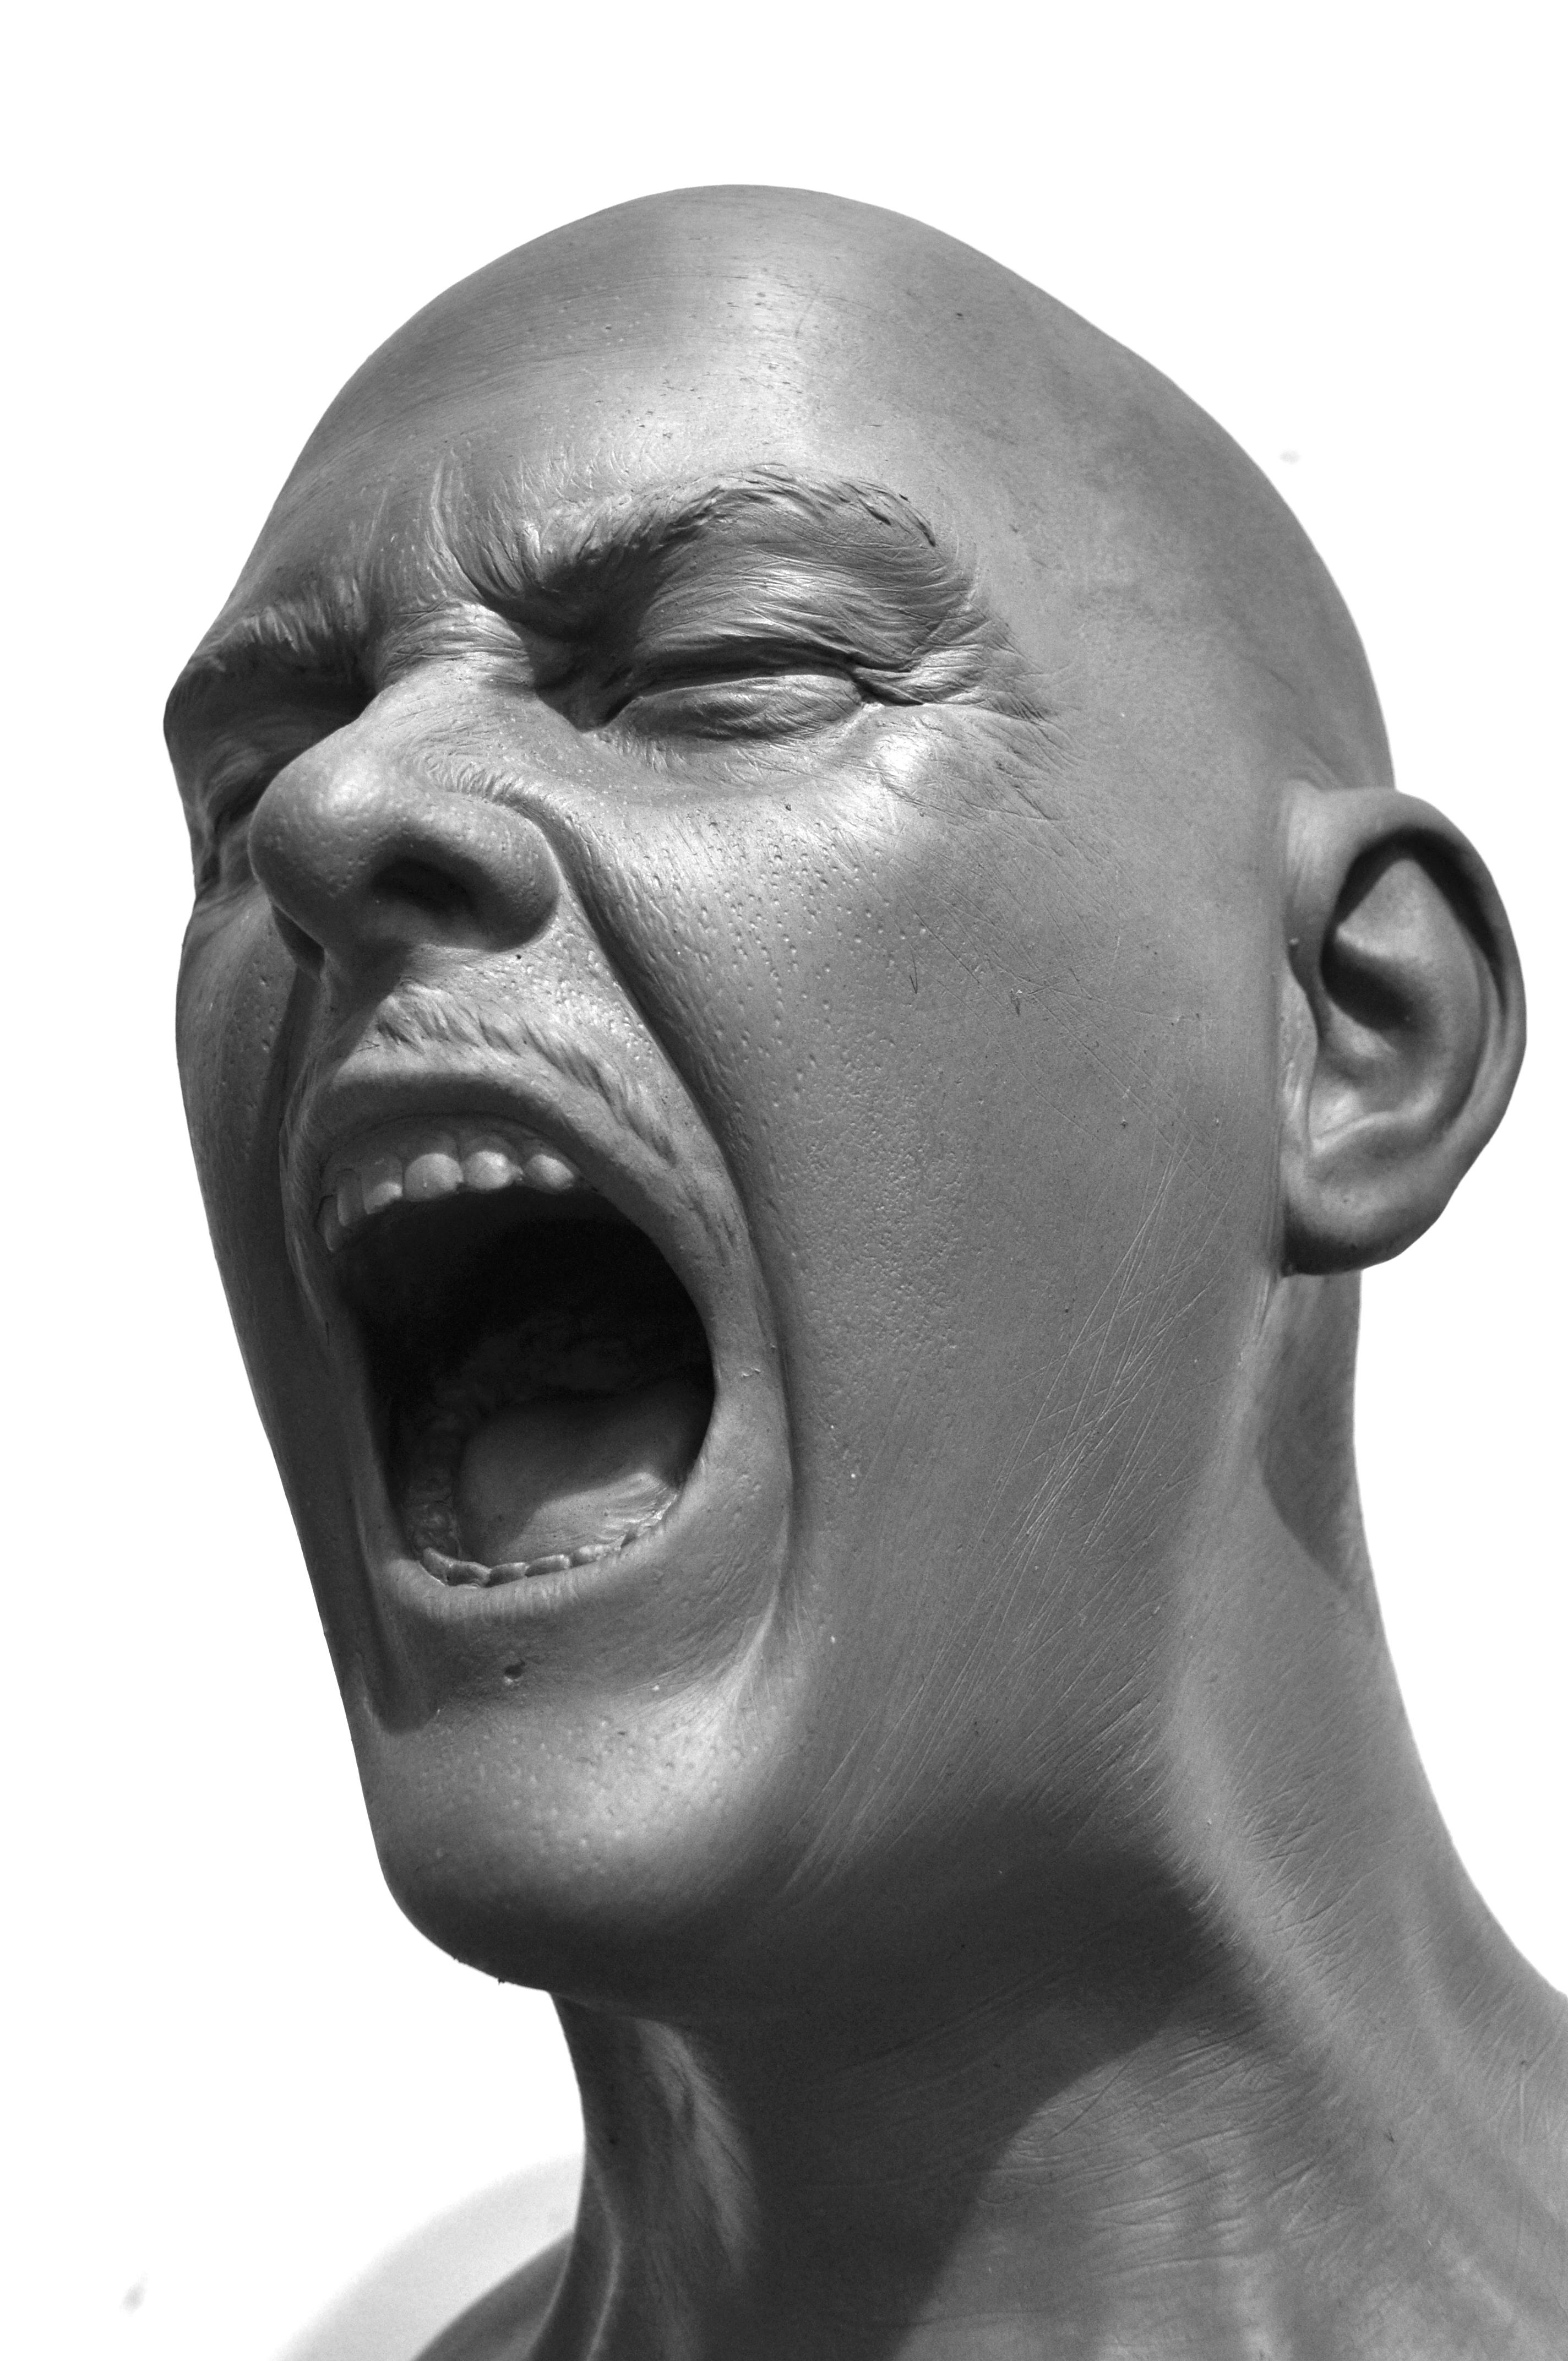 screaming_man_ii_by_death_a_holic-d4gb4gn